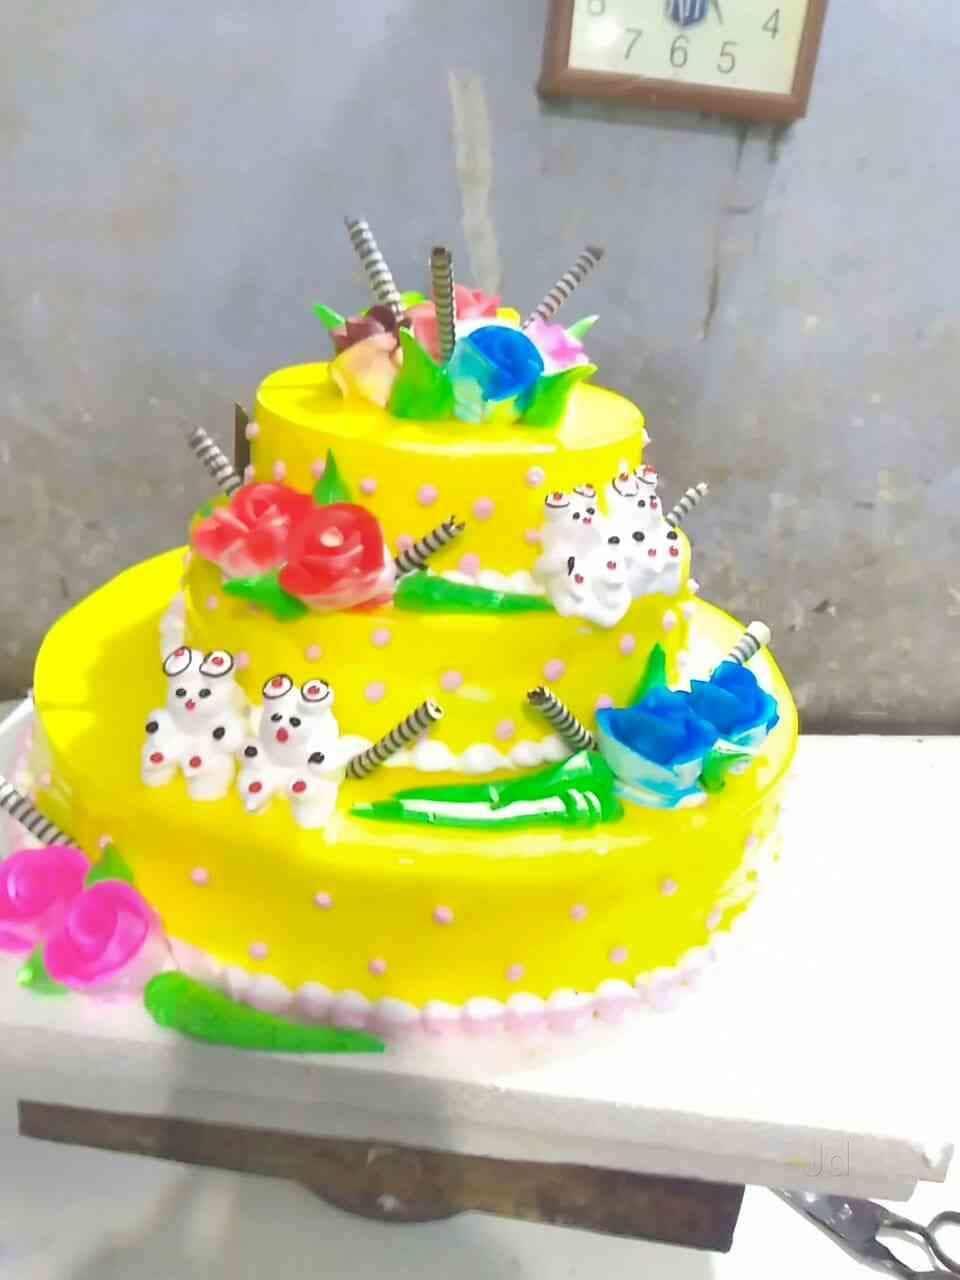 Top 8 Cake Delivery Services In Pandeypur Varanasi